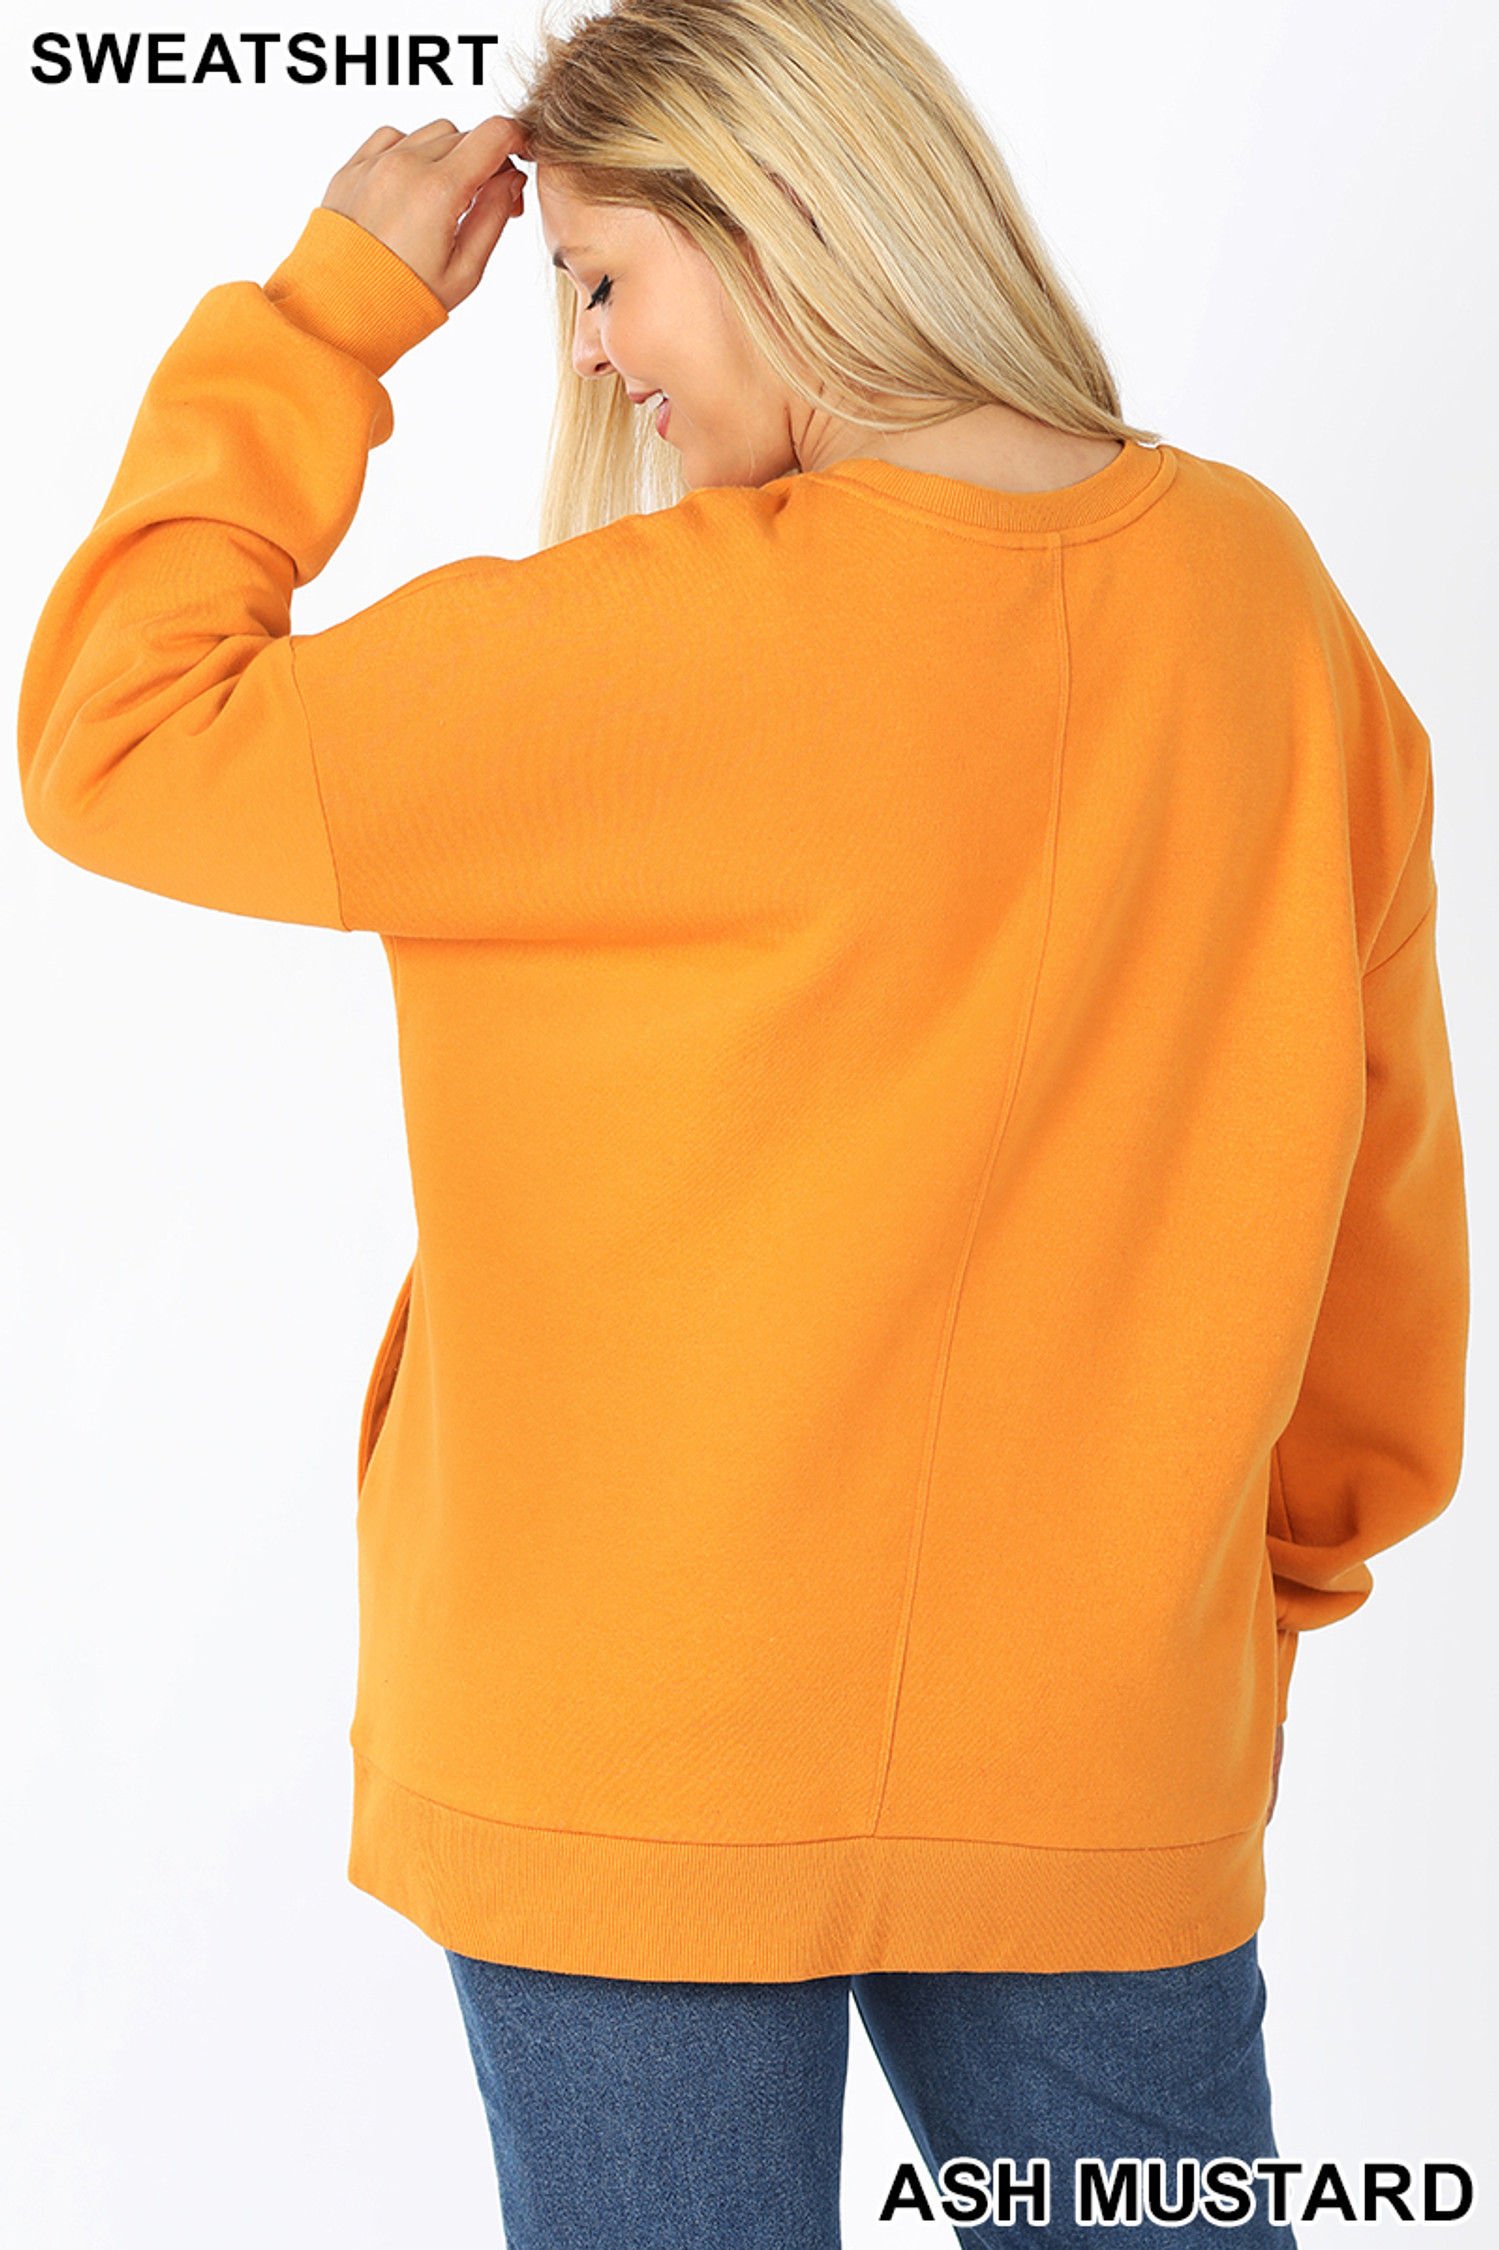 Back image of Ash Mustard Cotton Round Crew Neck Plus Size Sweatshirt with Side Pockets